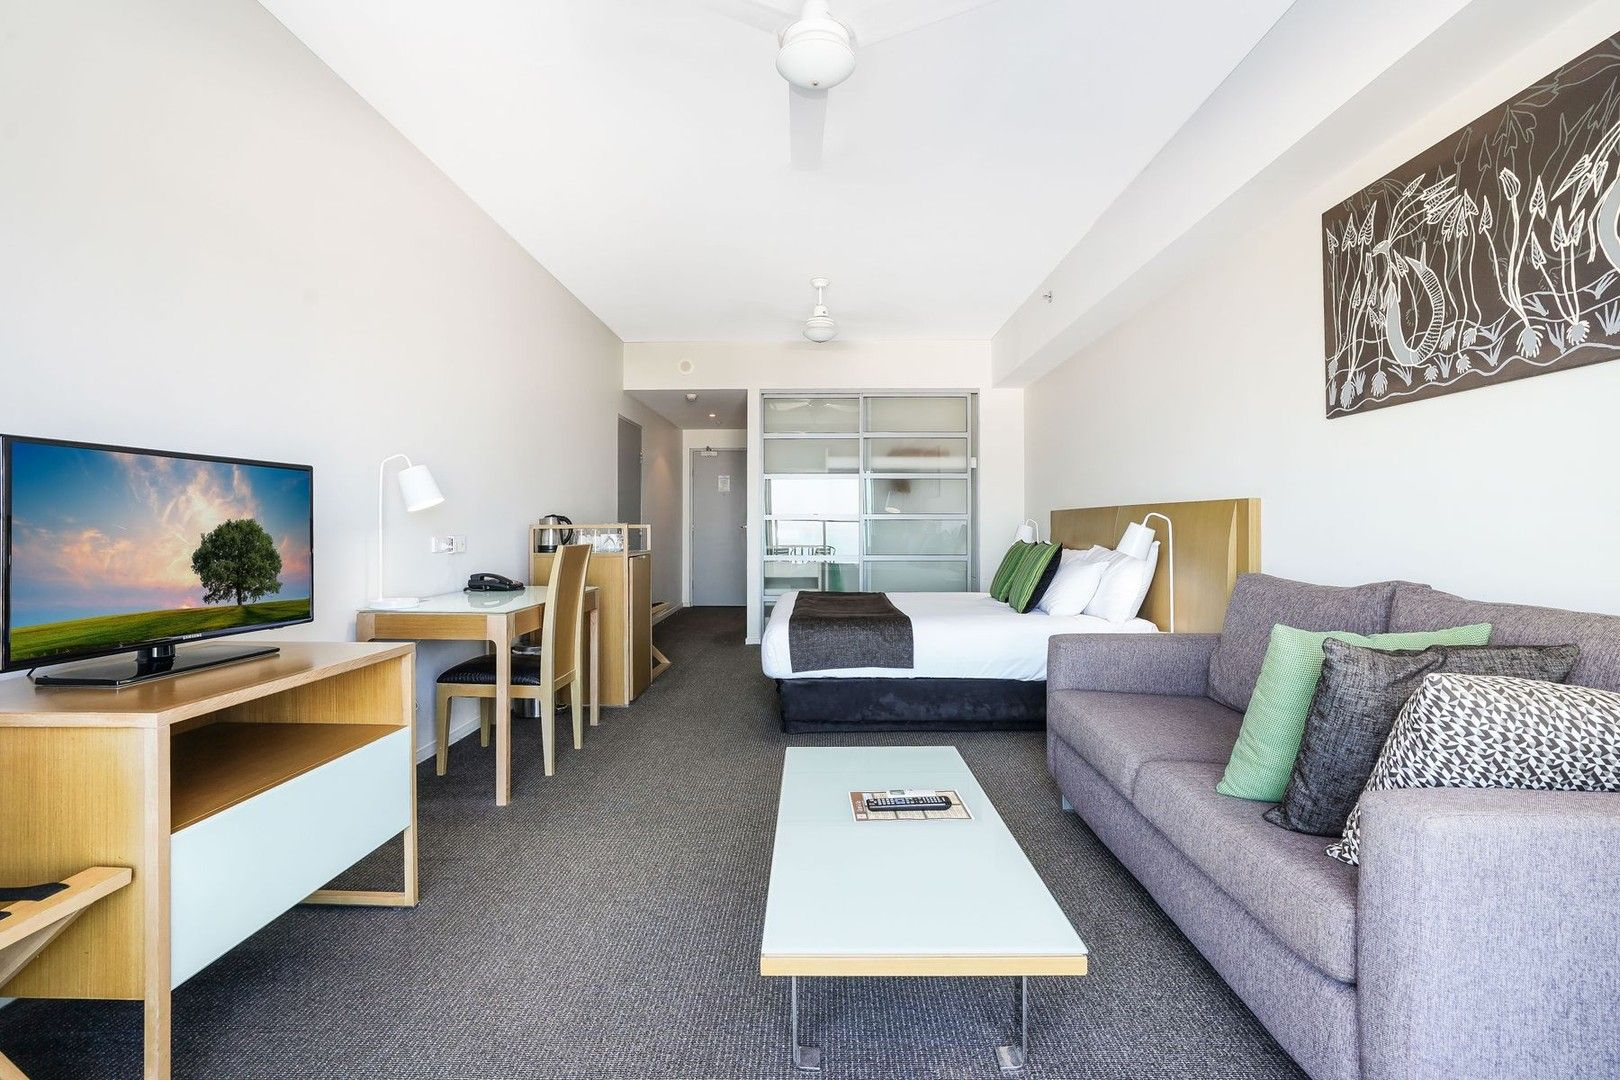 2 bedrooms Apartment / Unit / Flat in 1717/43B Knuckey Street DARWIN CITY NT, 0800